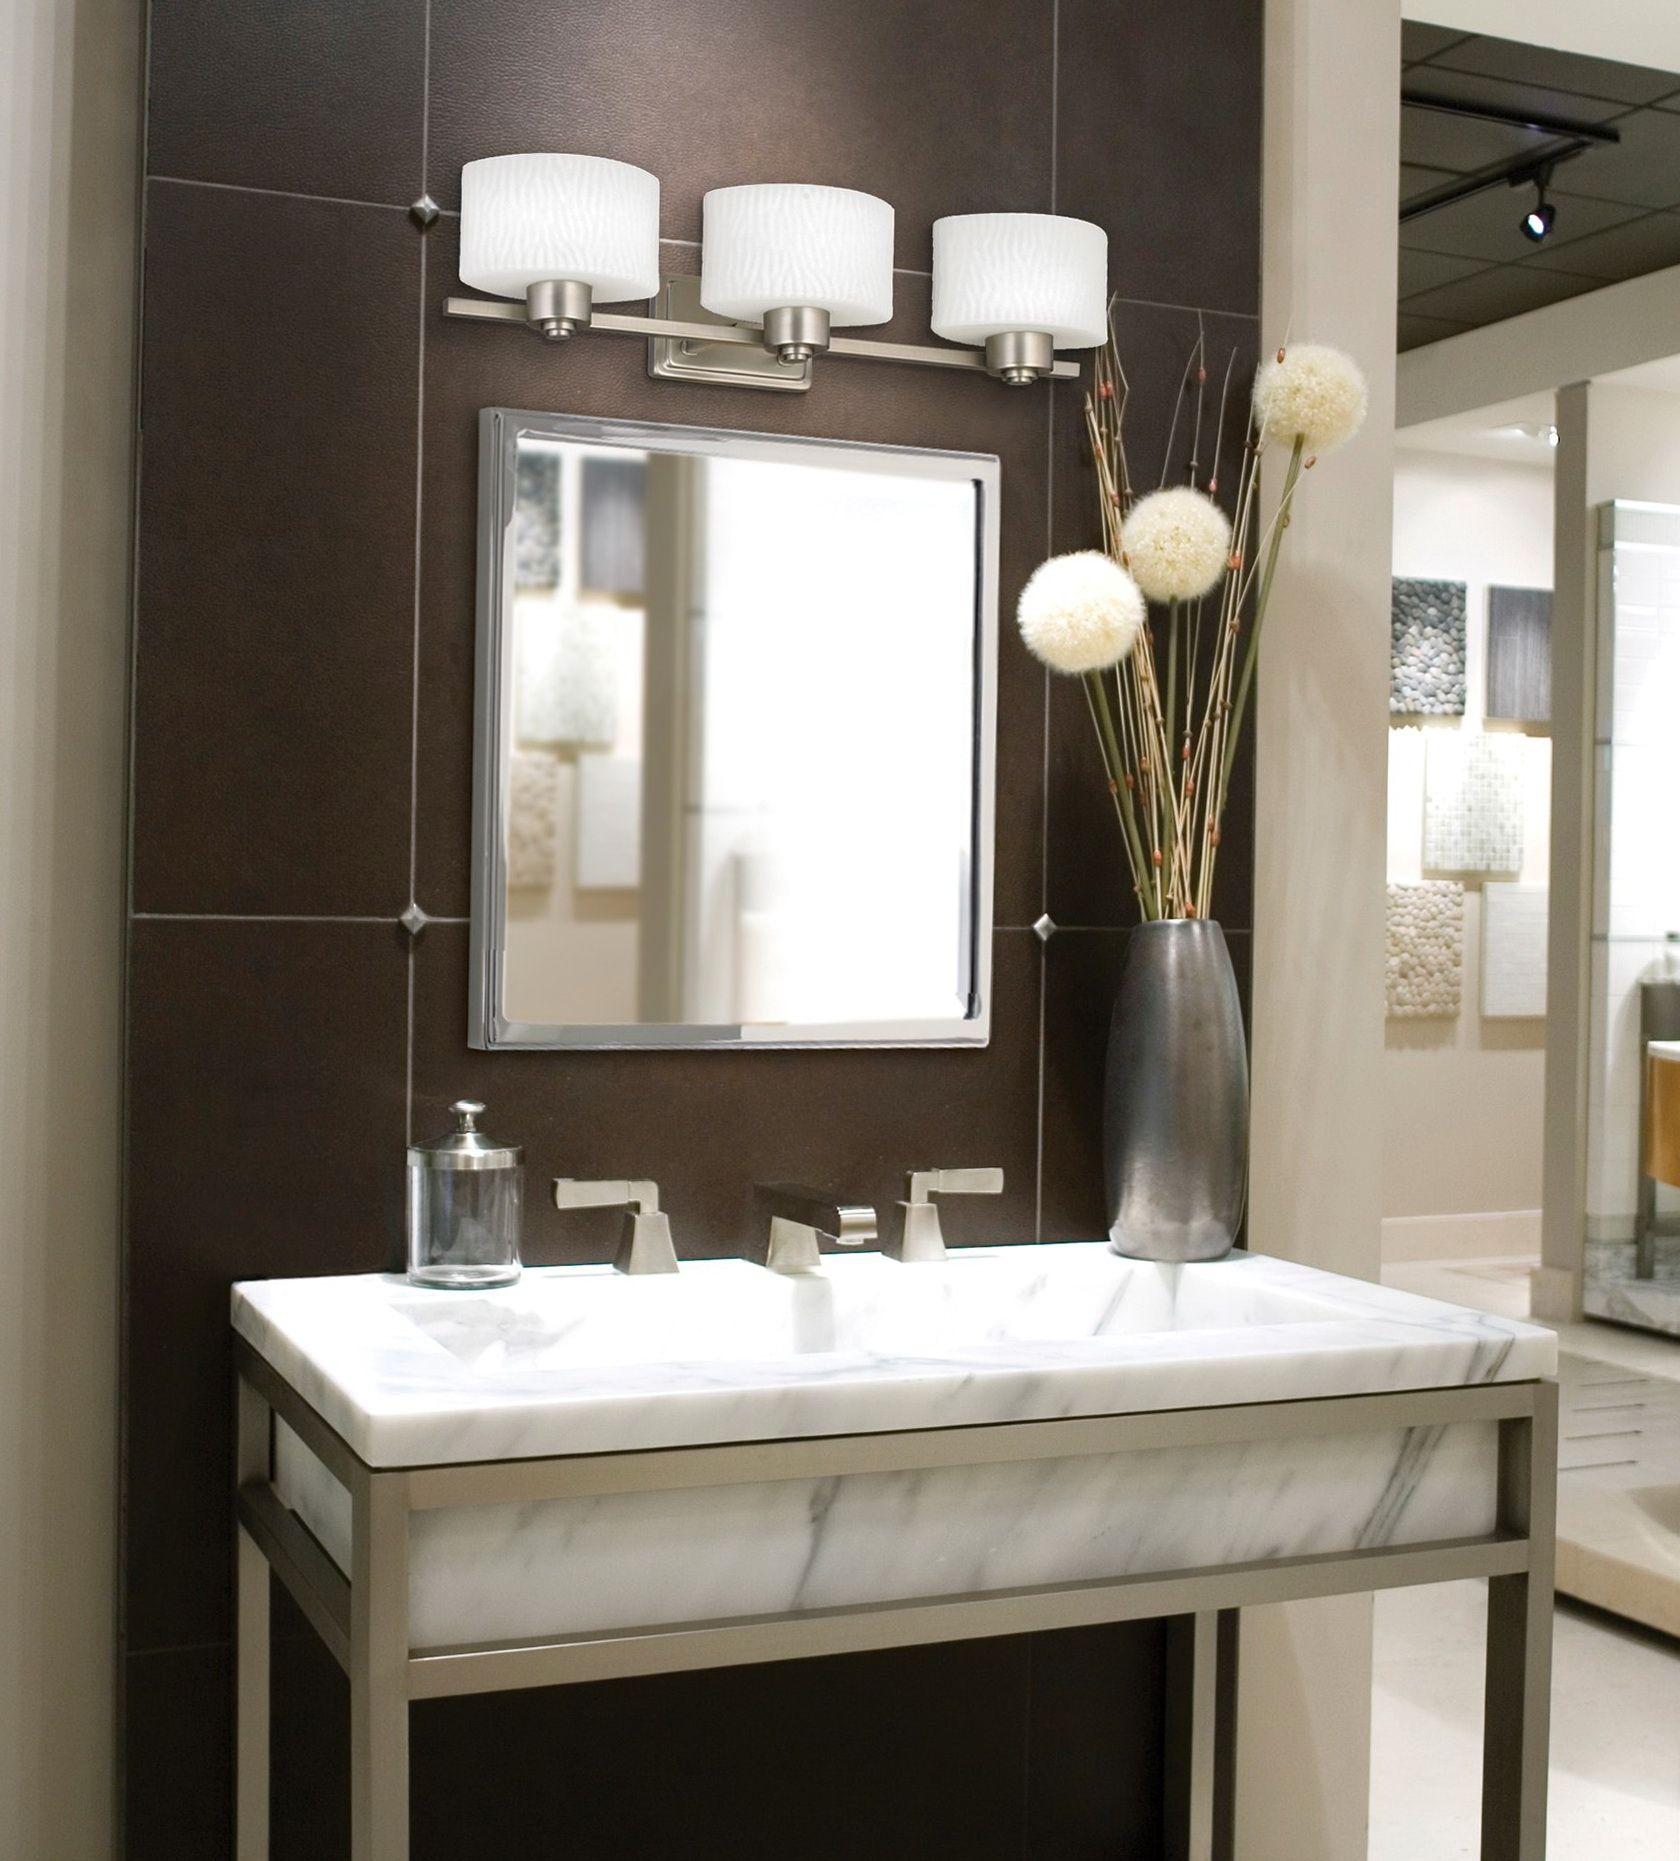 Bathroom lighting mirror ideas drrw pinterest